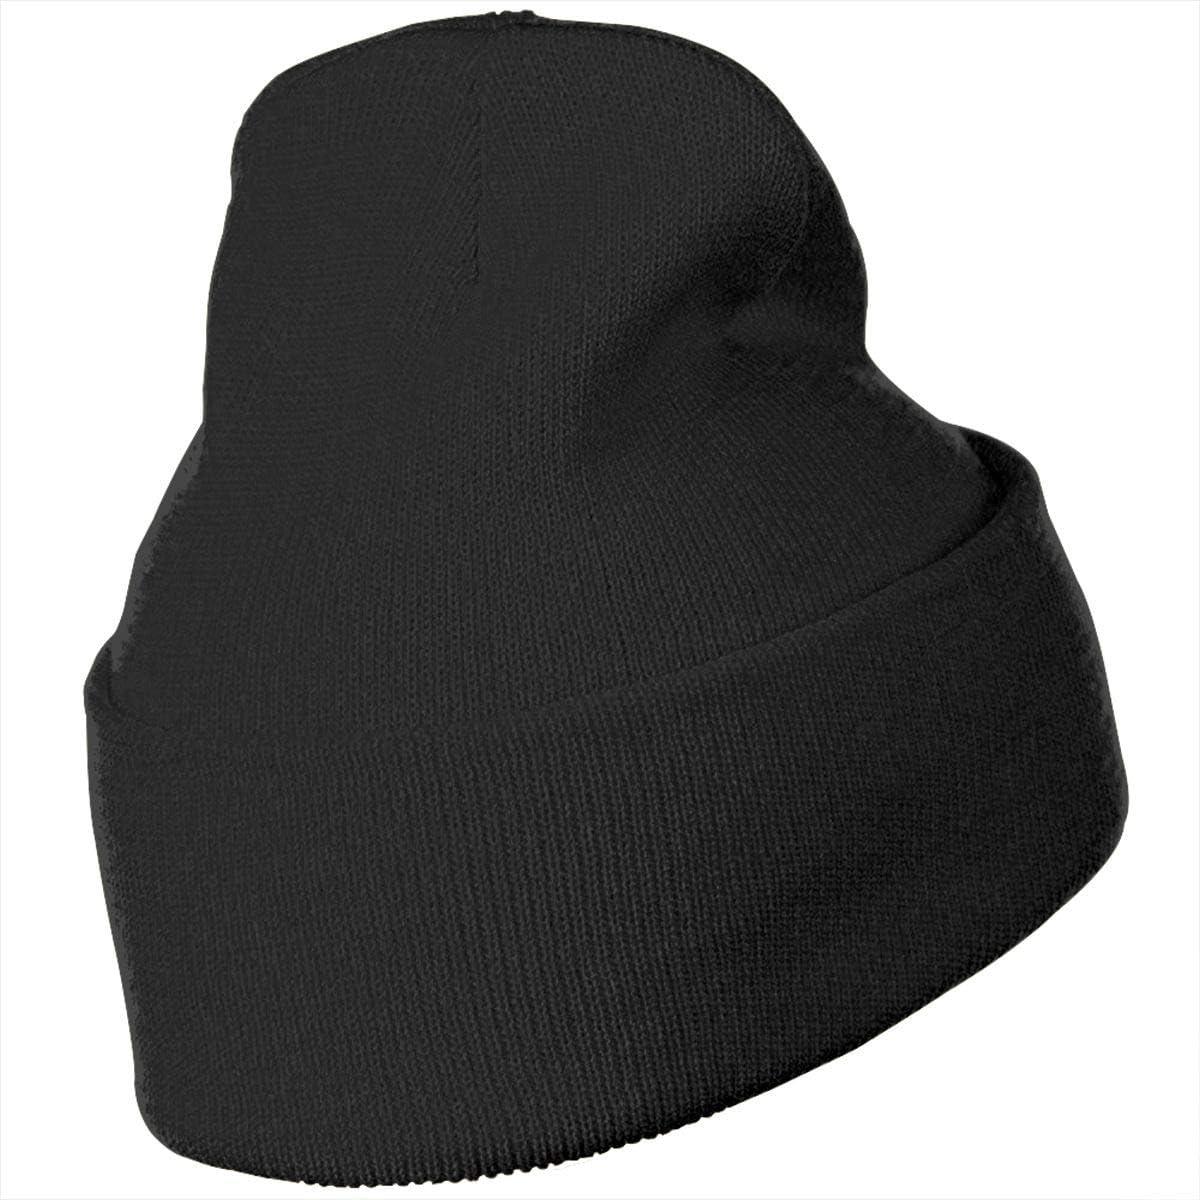 Yubb7E Sea-Sailing Warm Knit Winter Solid Beanie Hat Unisex Skull Cap